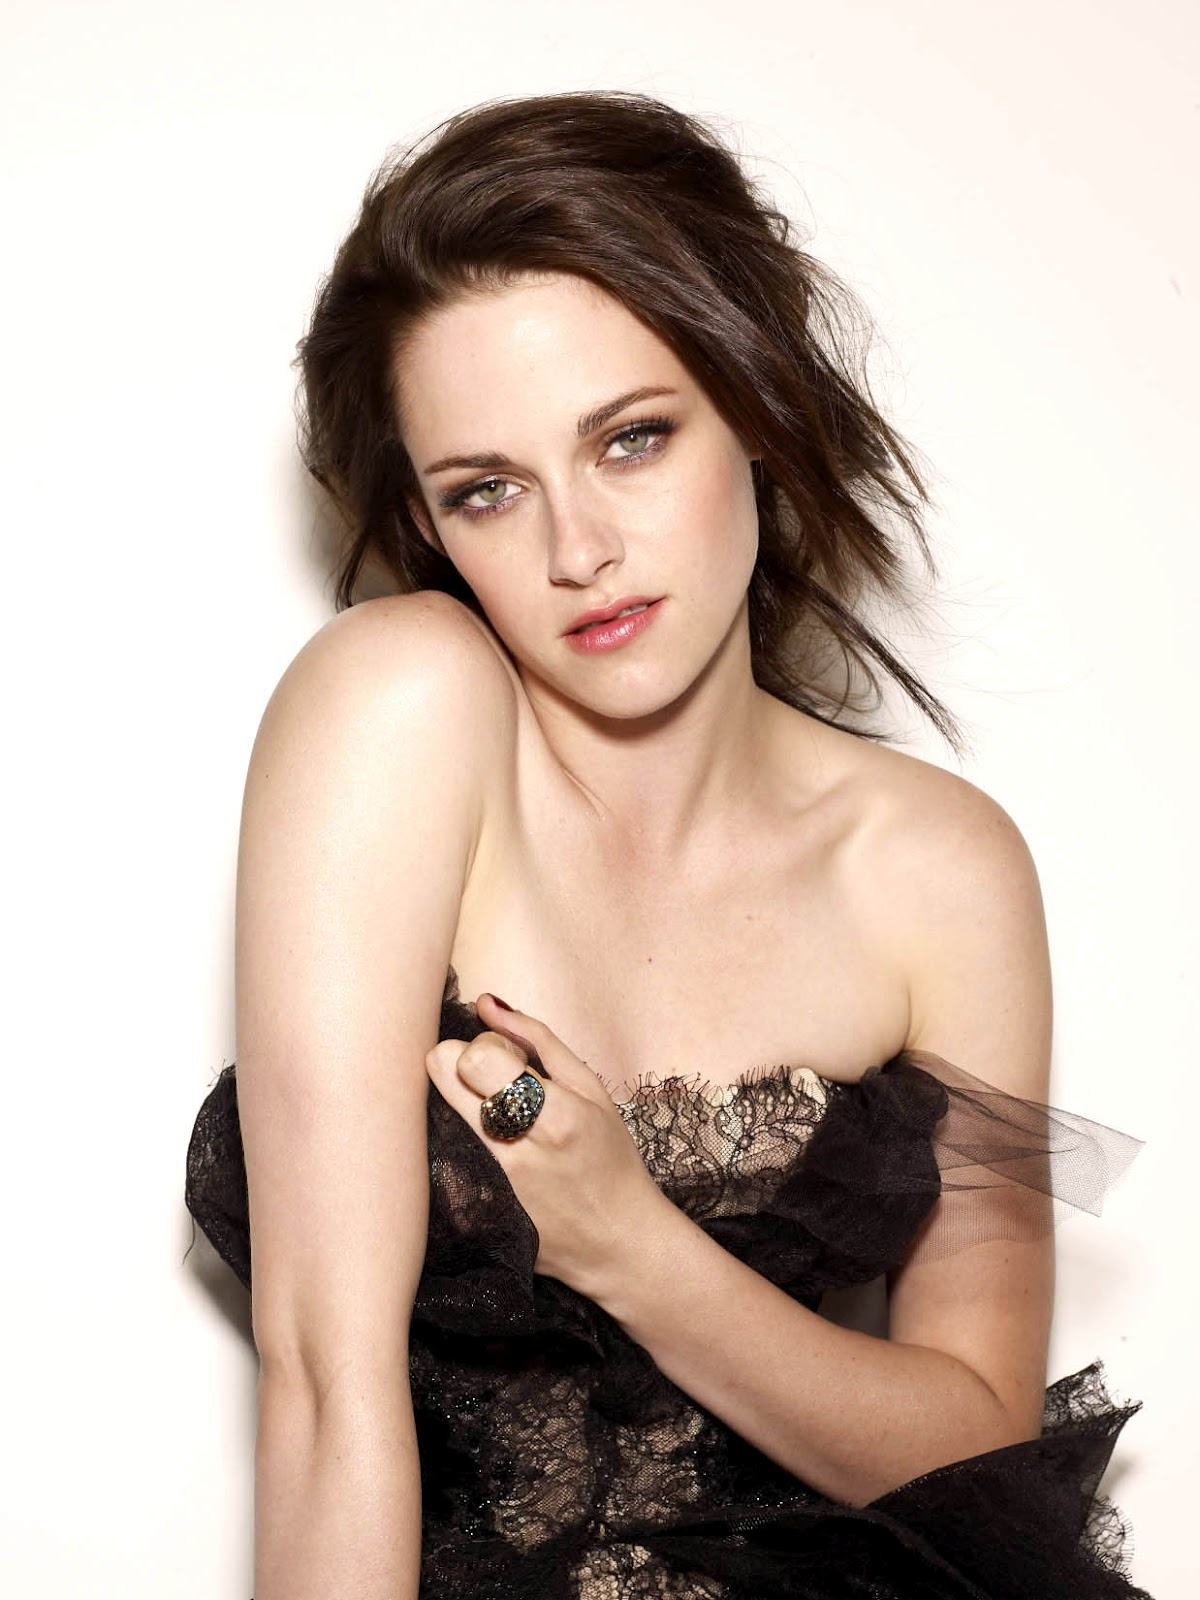 plus belle femmes